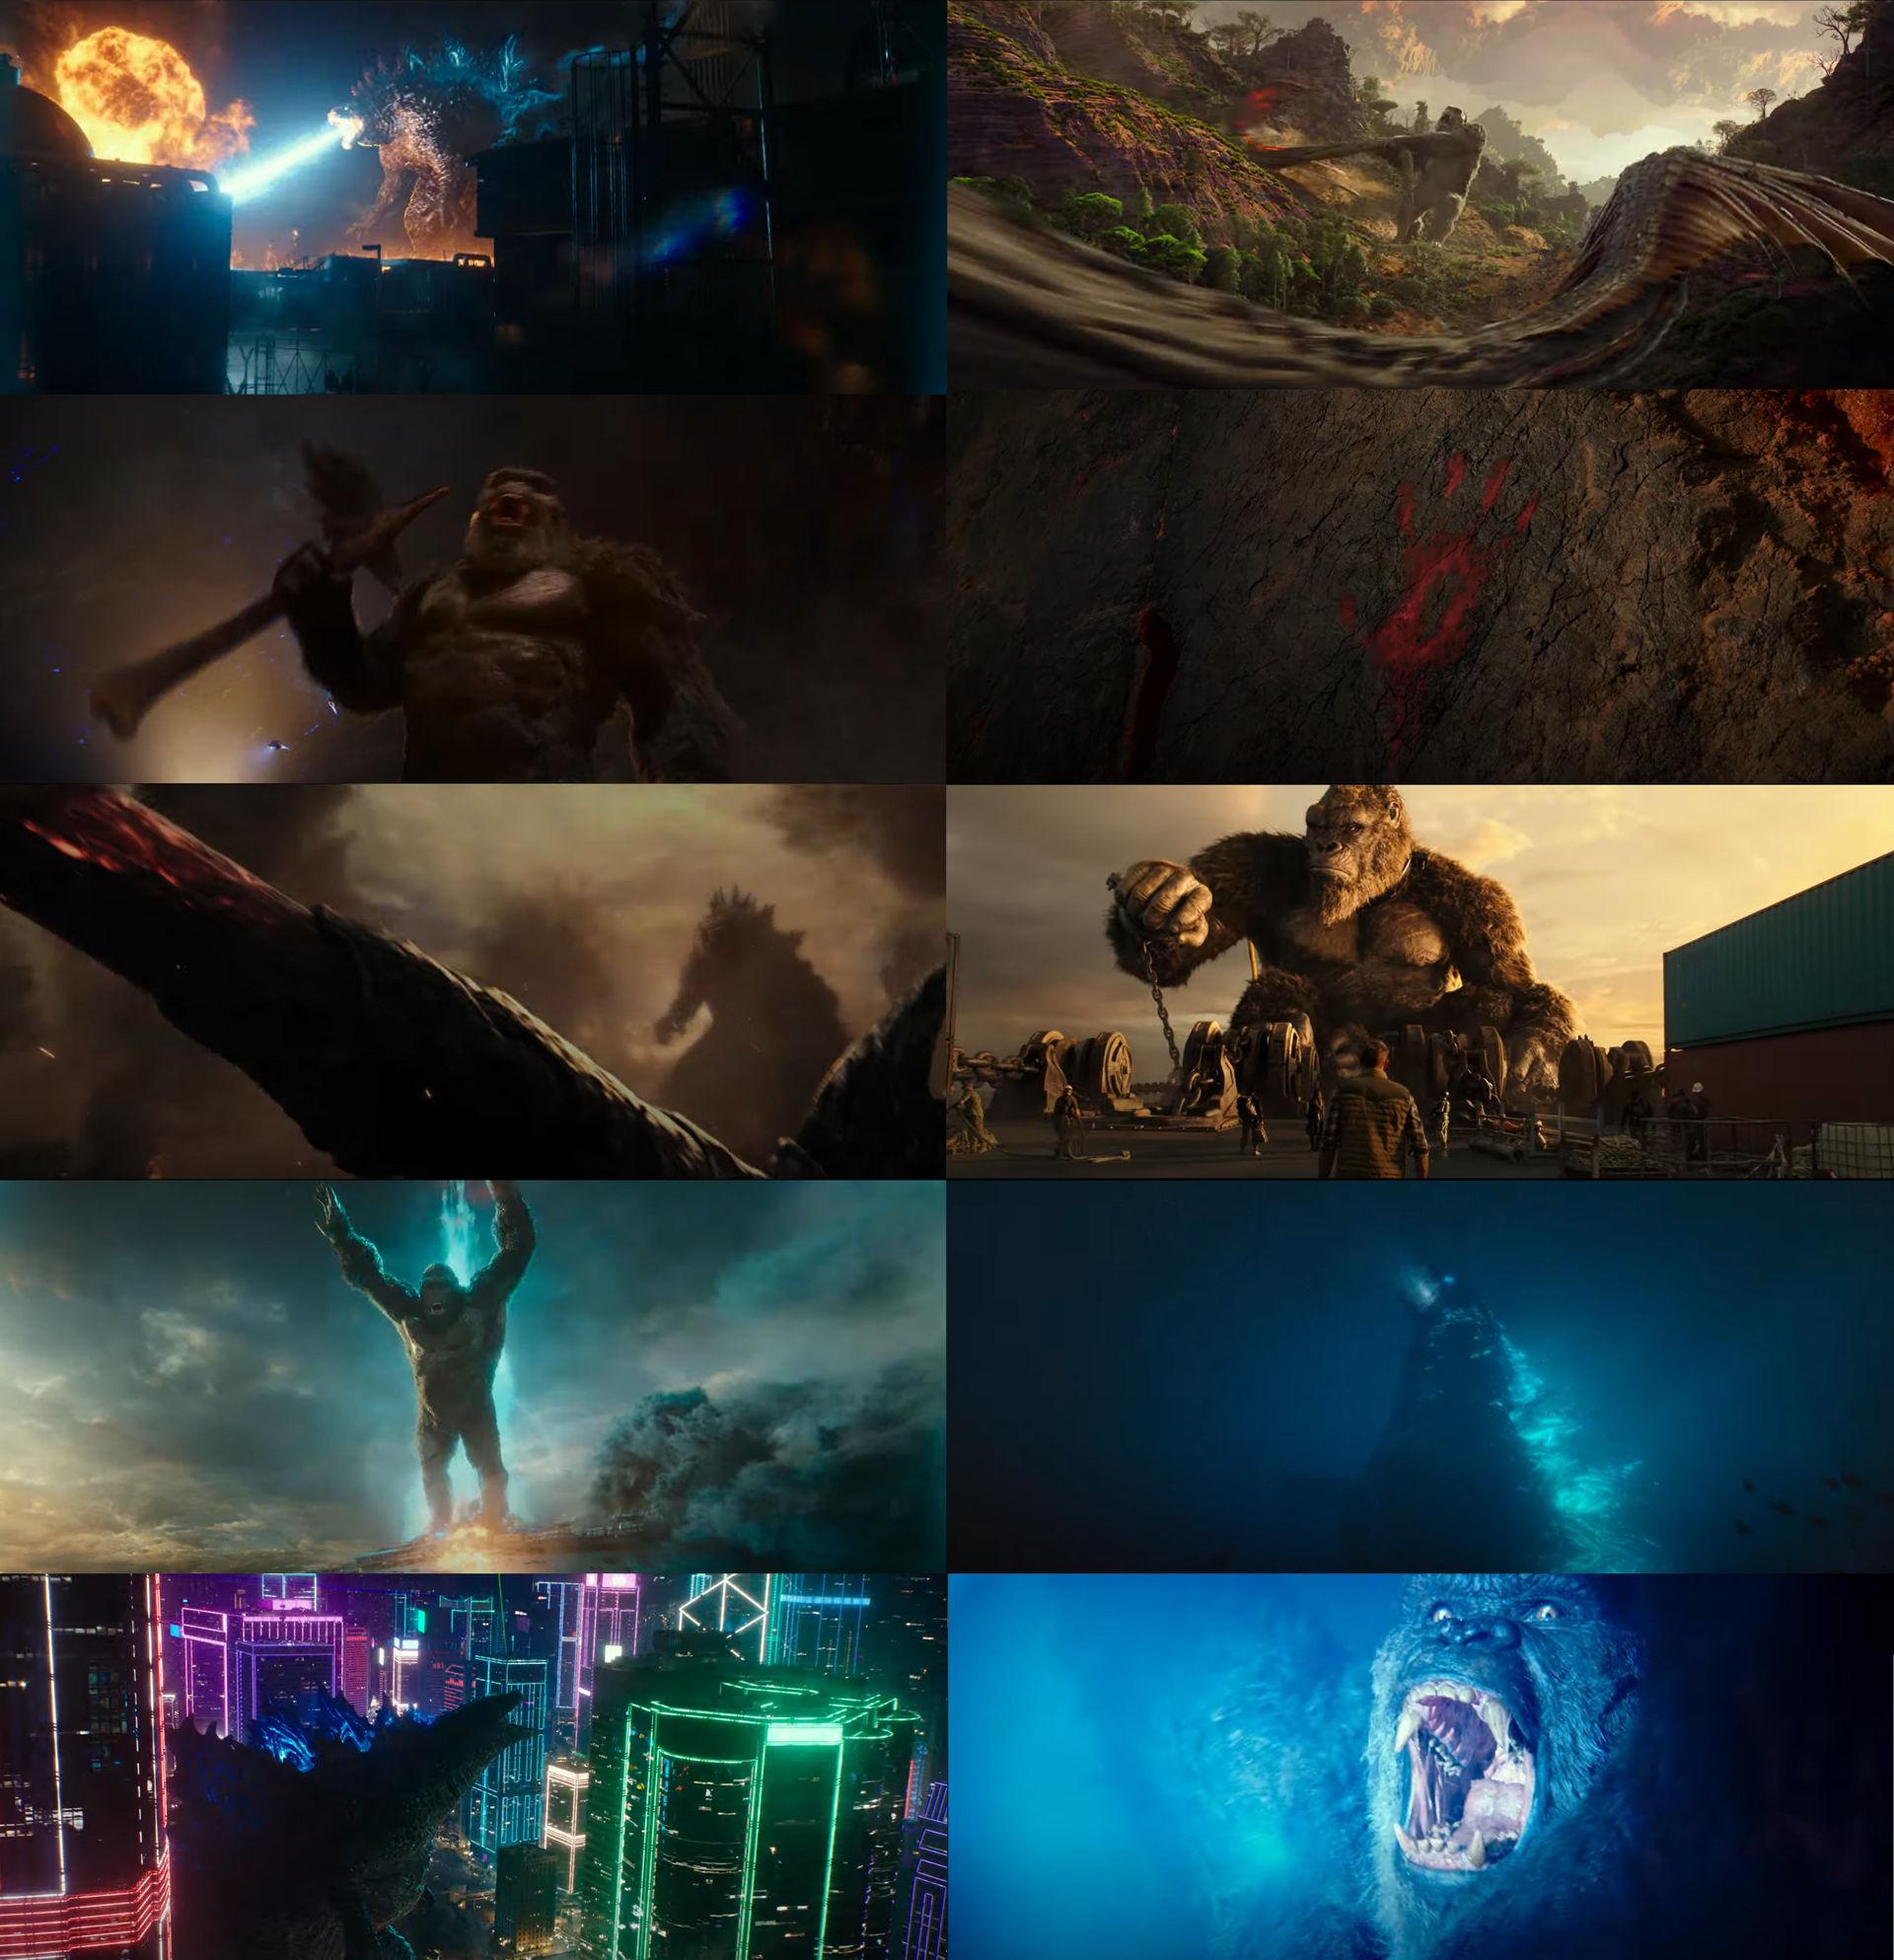 Godzilla vs Kong Trailer 1 by MnstrFrc on DeviantArt